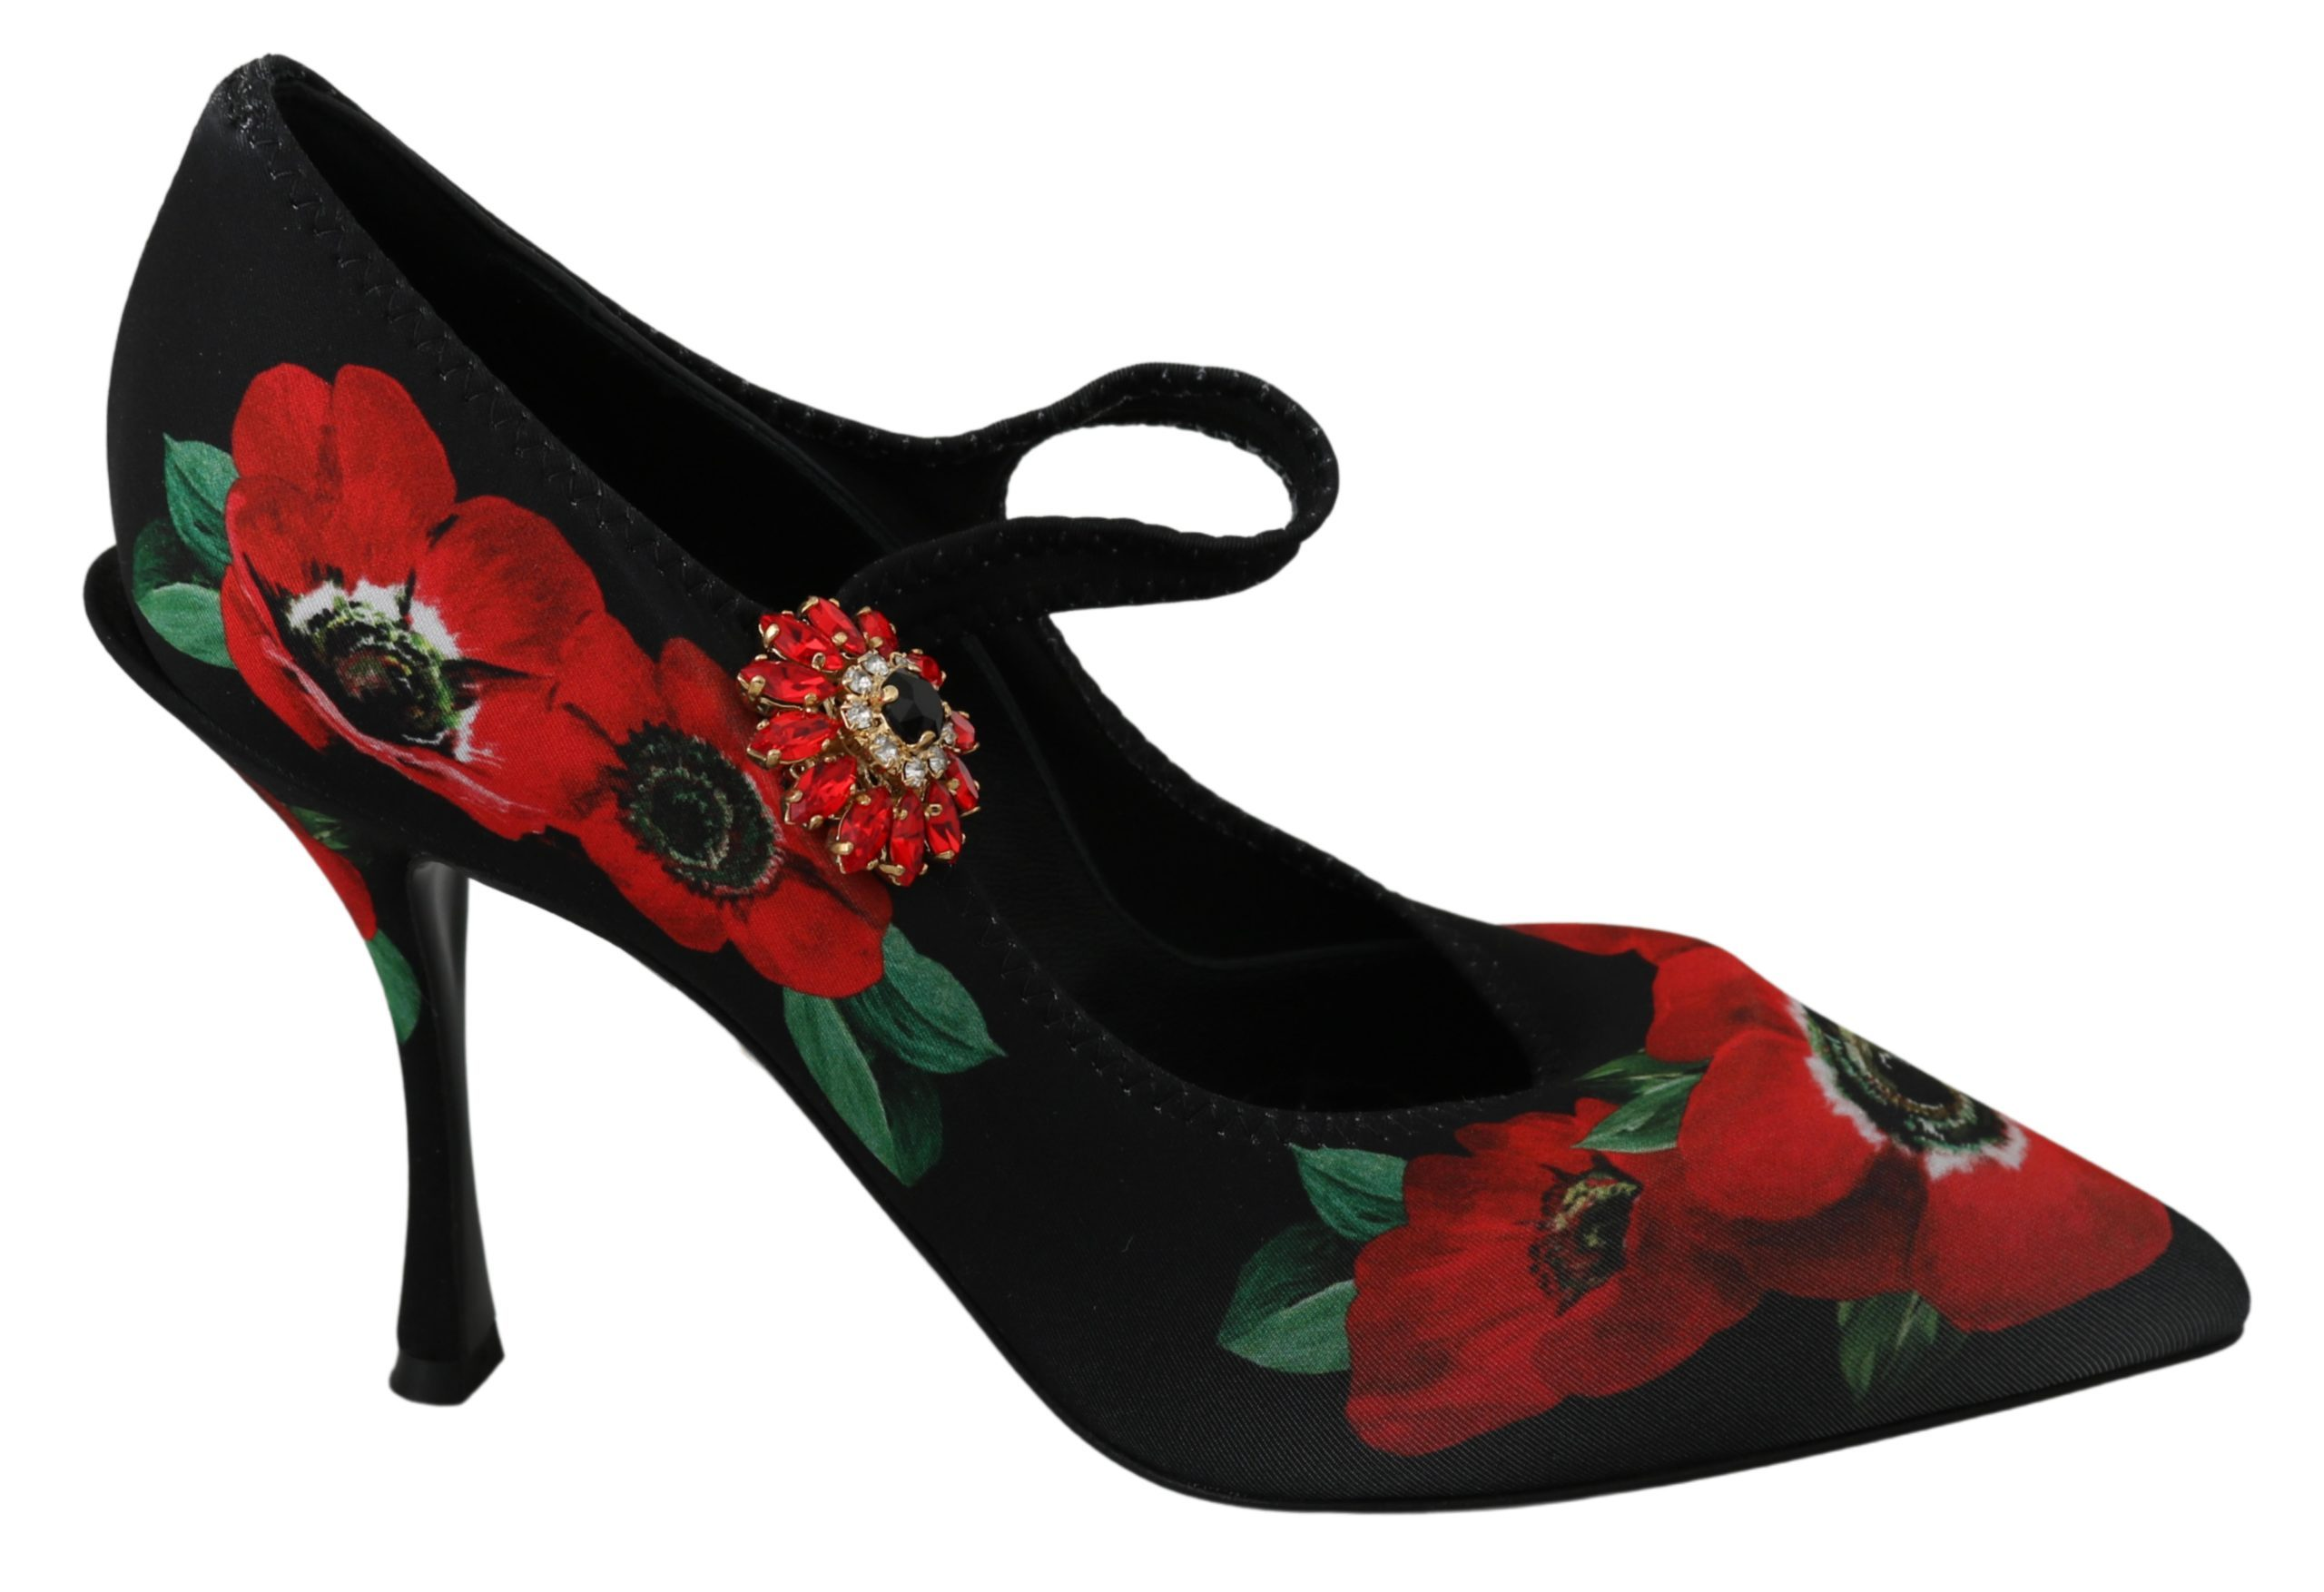 Dolce & Gabbana Women's Floral Mary Janes Pumps Red LA6586 - EU41/US10.5